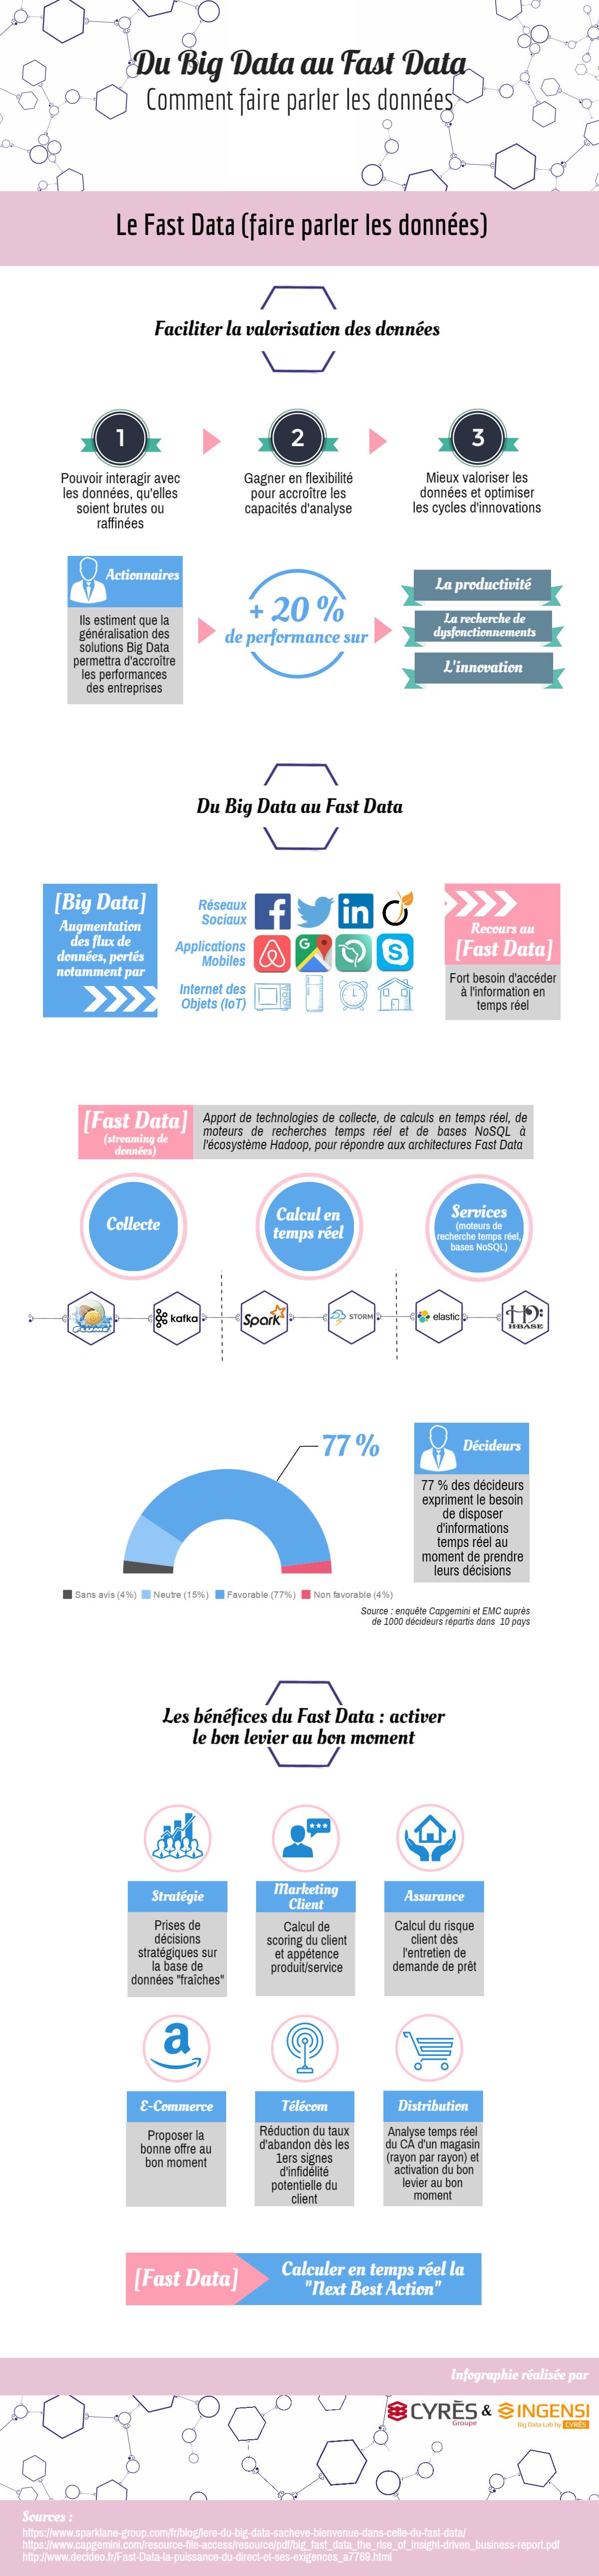 12 Du Big Data au Fast Data_Le Fast Data